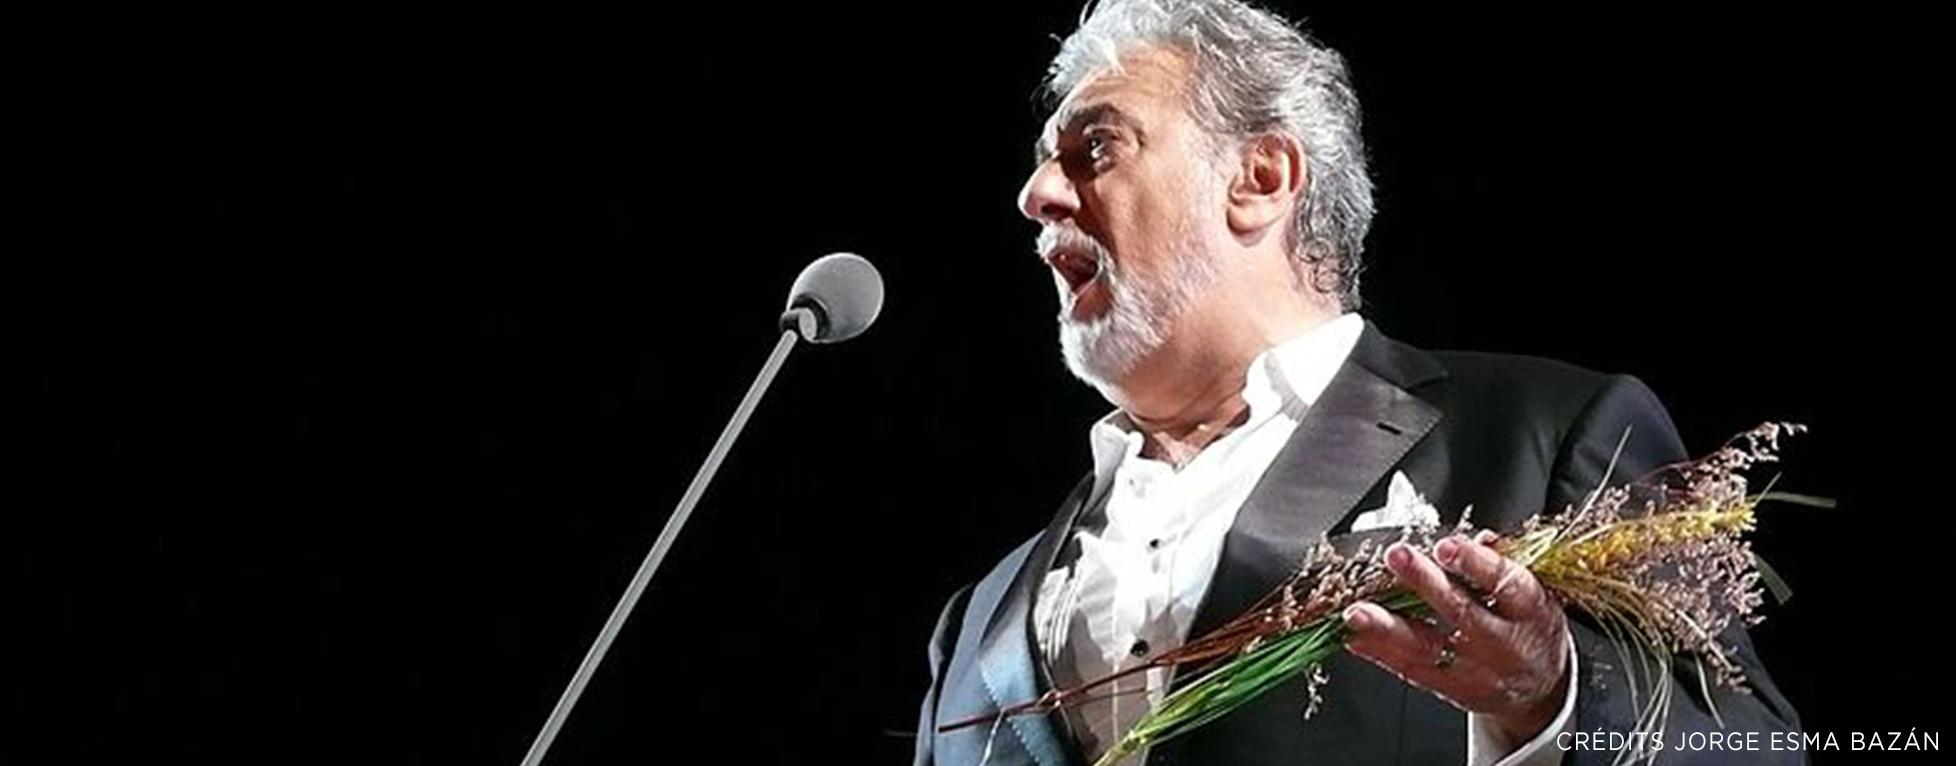 Plácido Domingo chantera bien à Berlin cette semaine